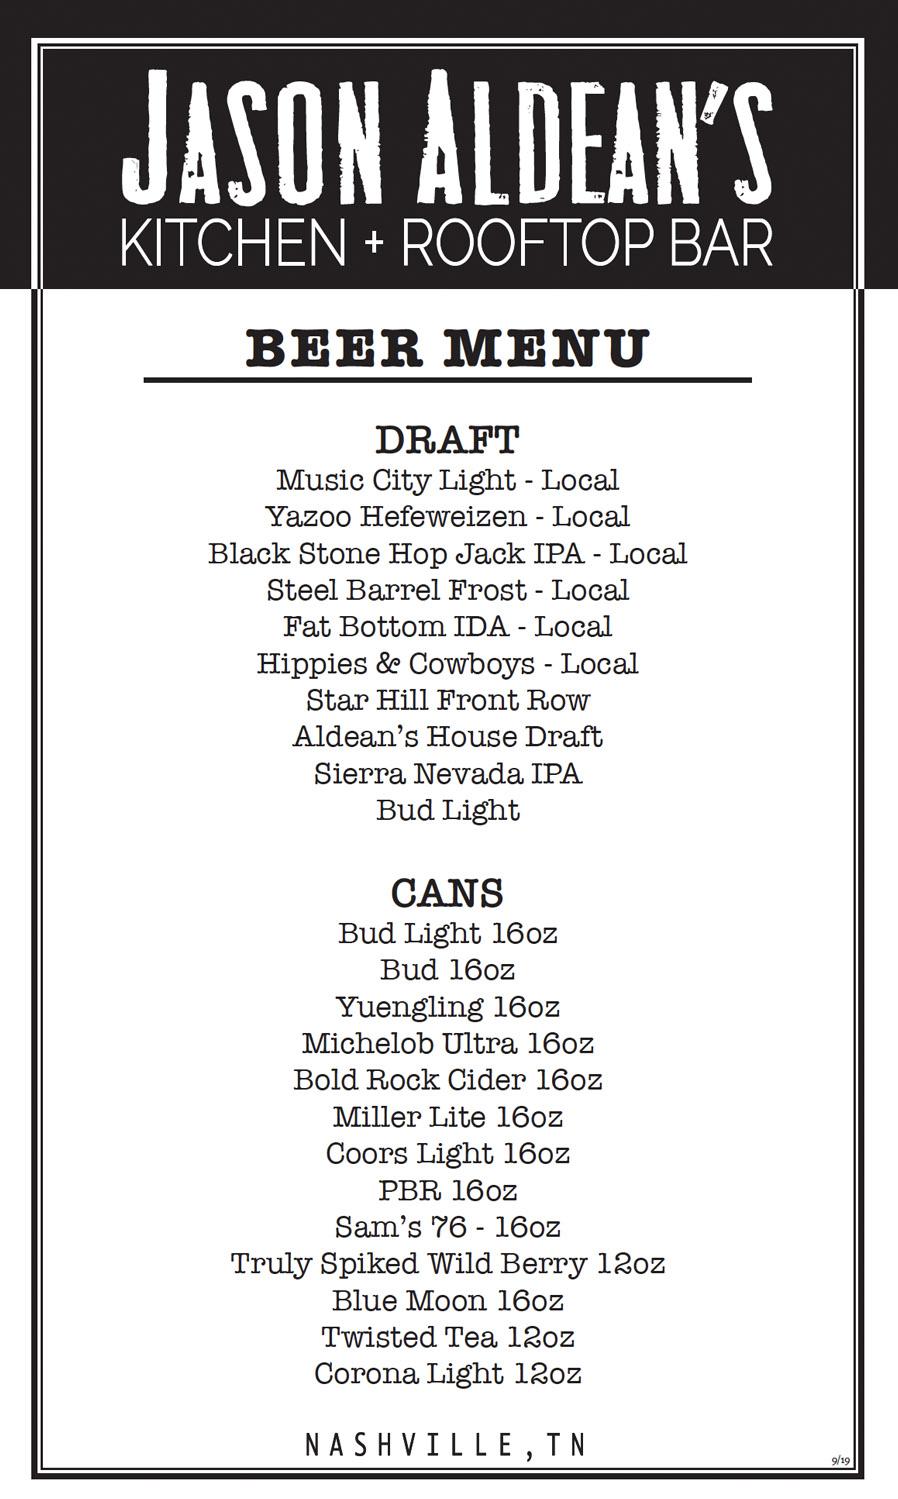 Jason Aldean's Beer Menu